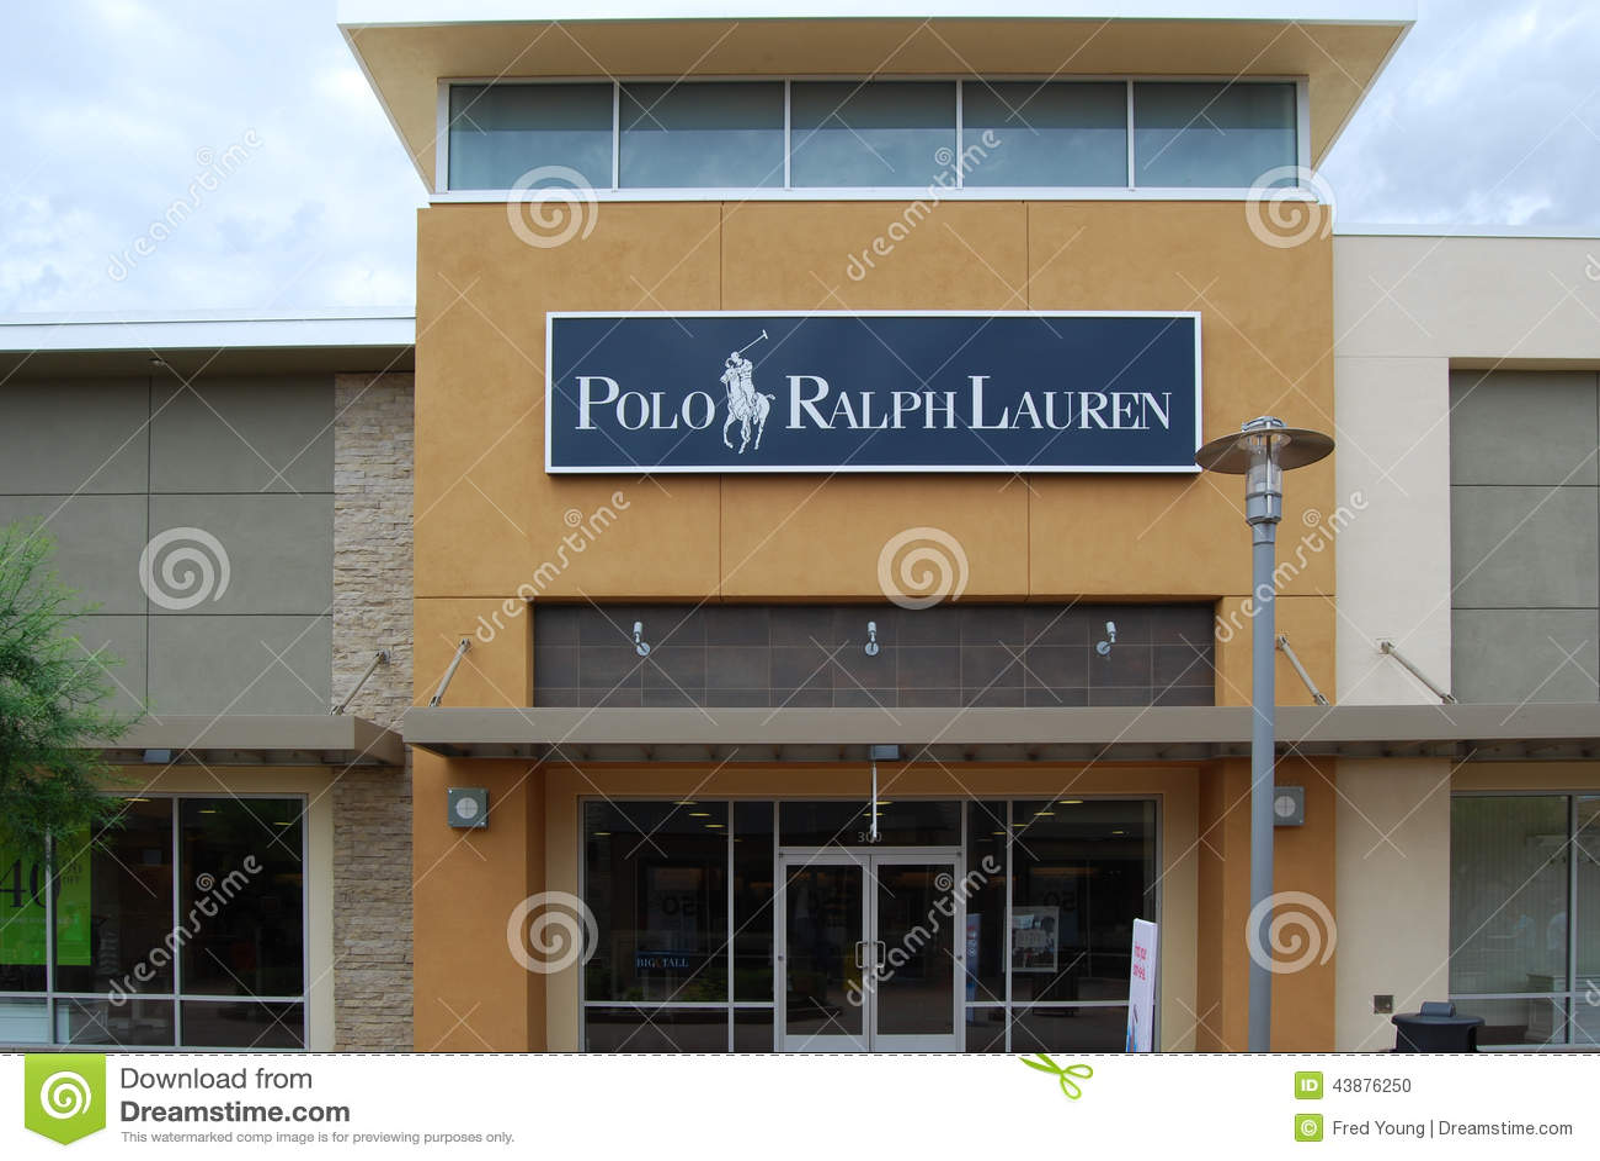 ralph polos ralph store